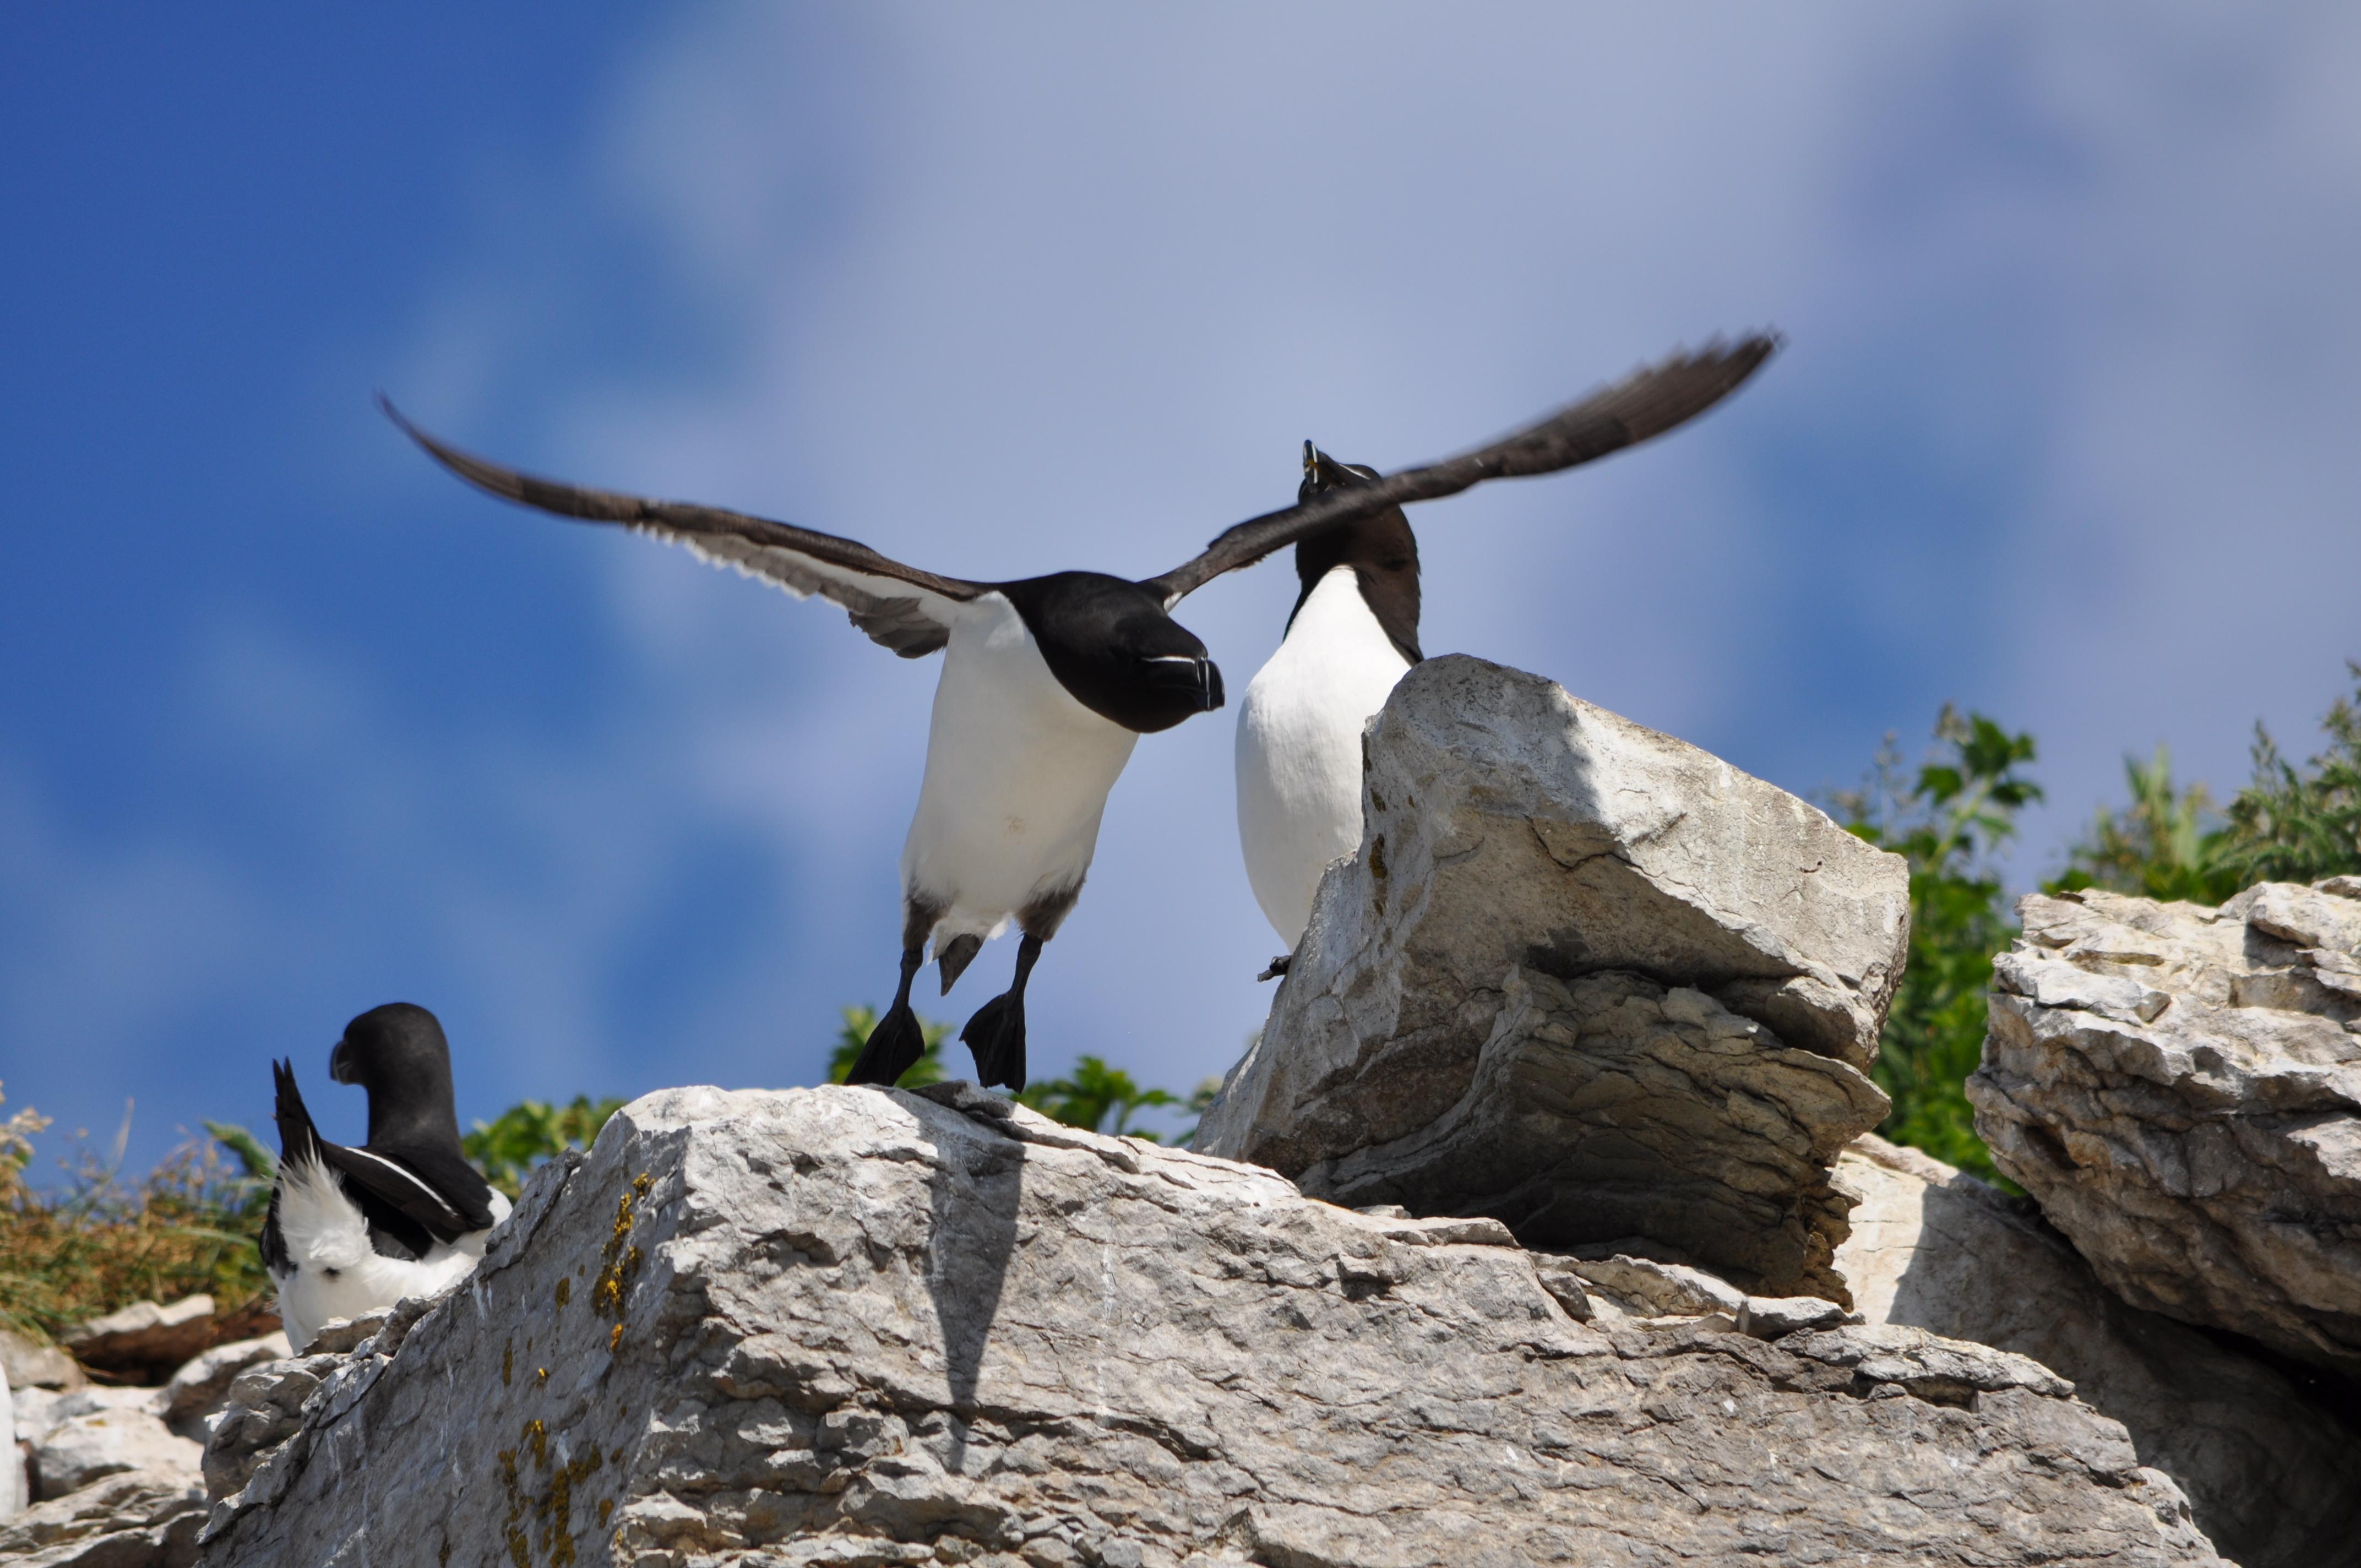 Mon pingouin est un manchot pas pas de chat - Pingouin rigolo ...